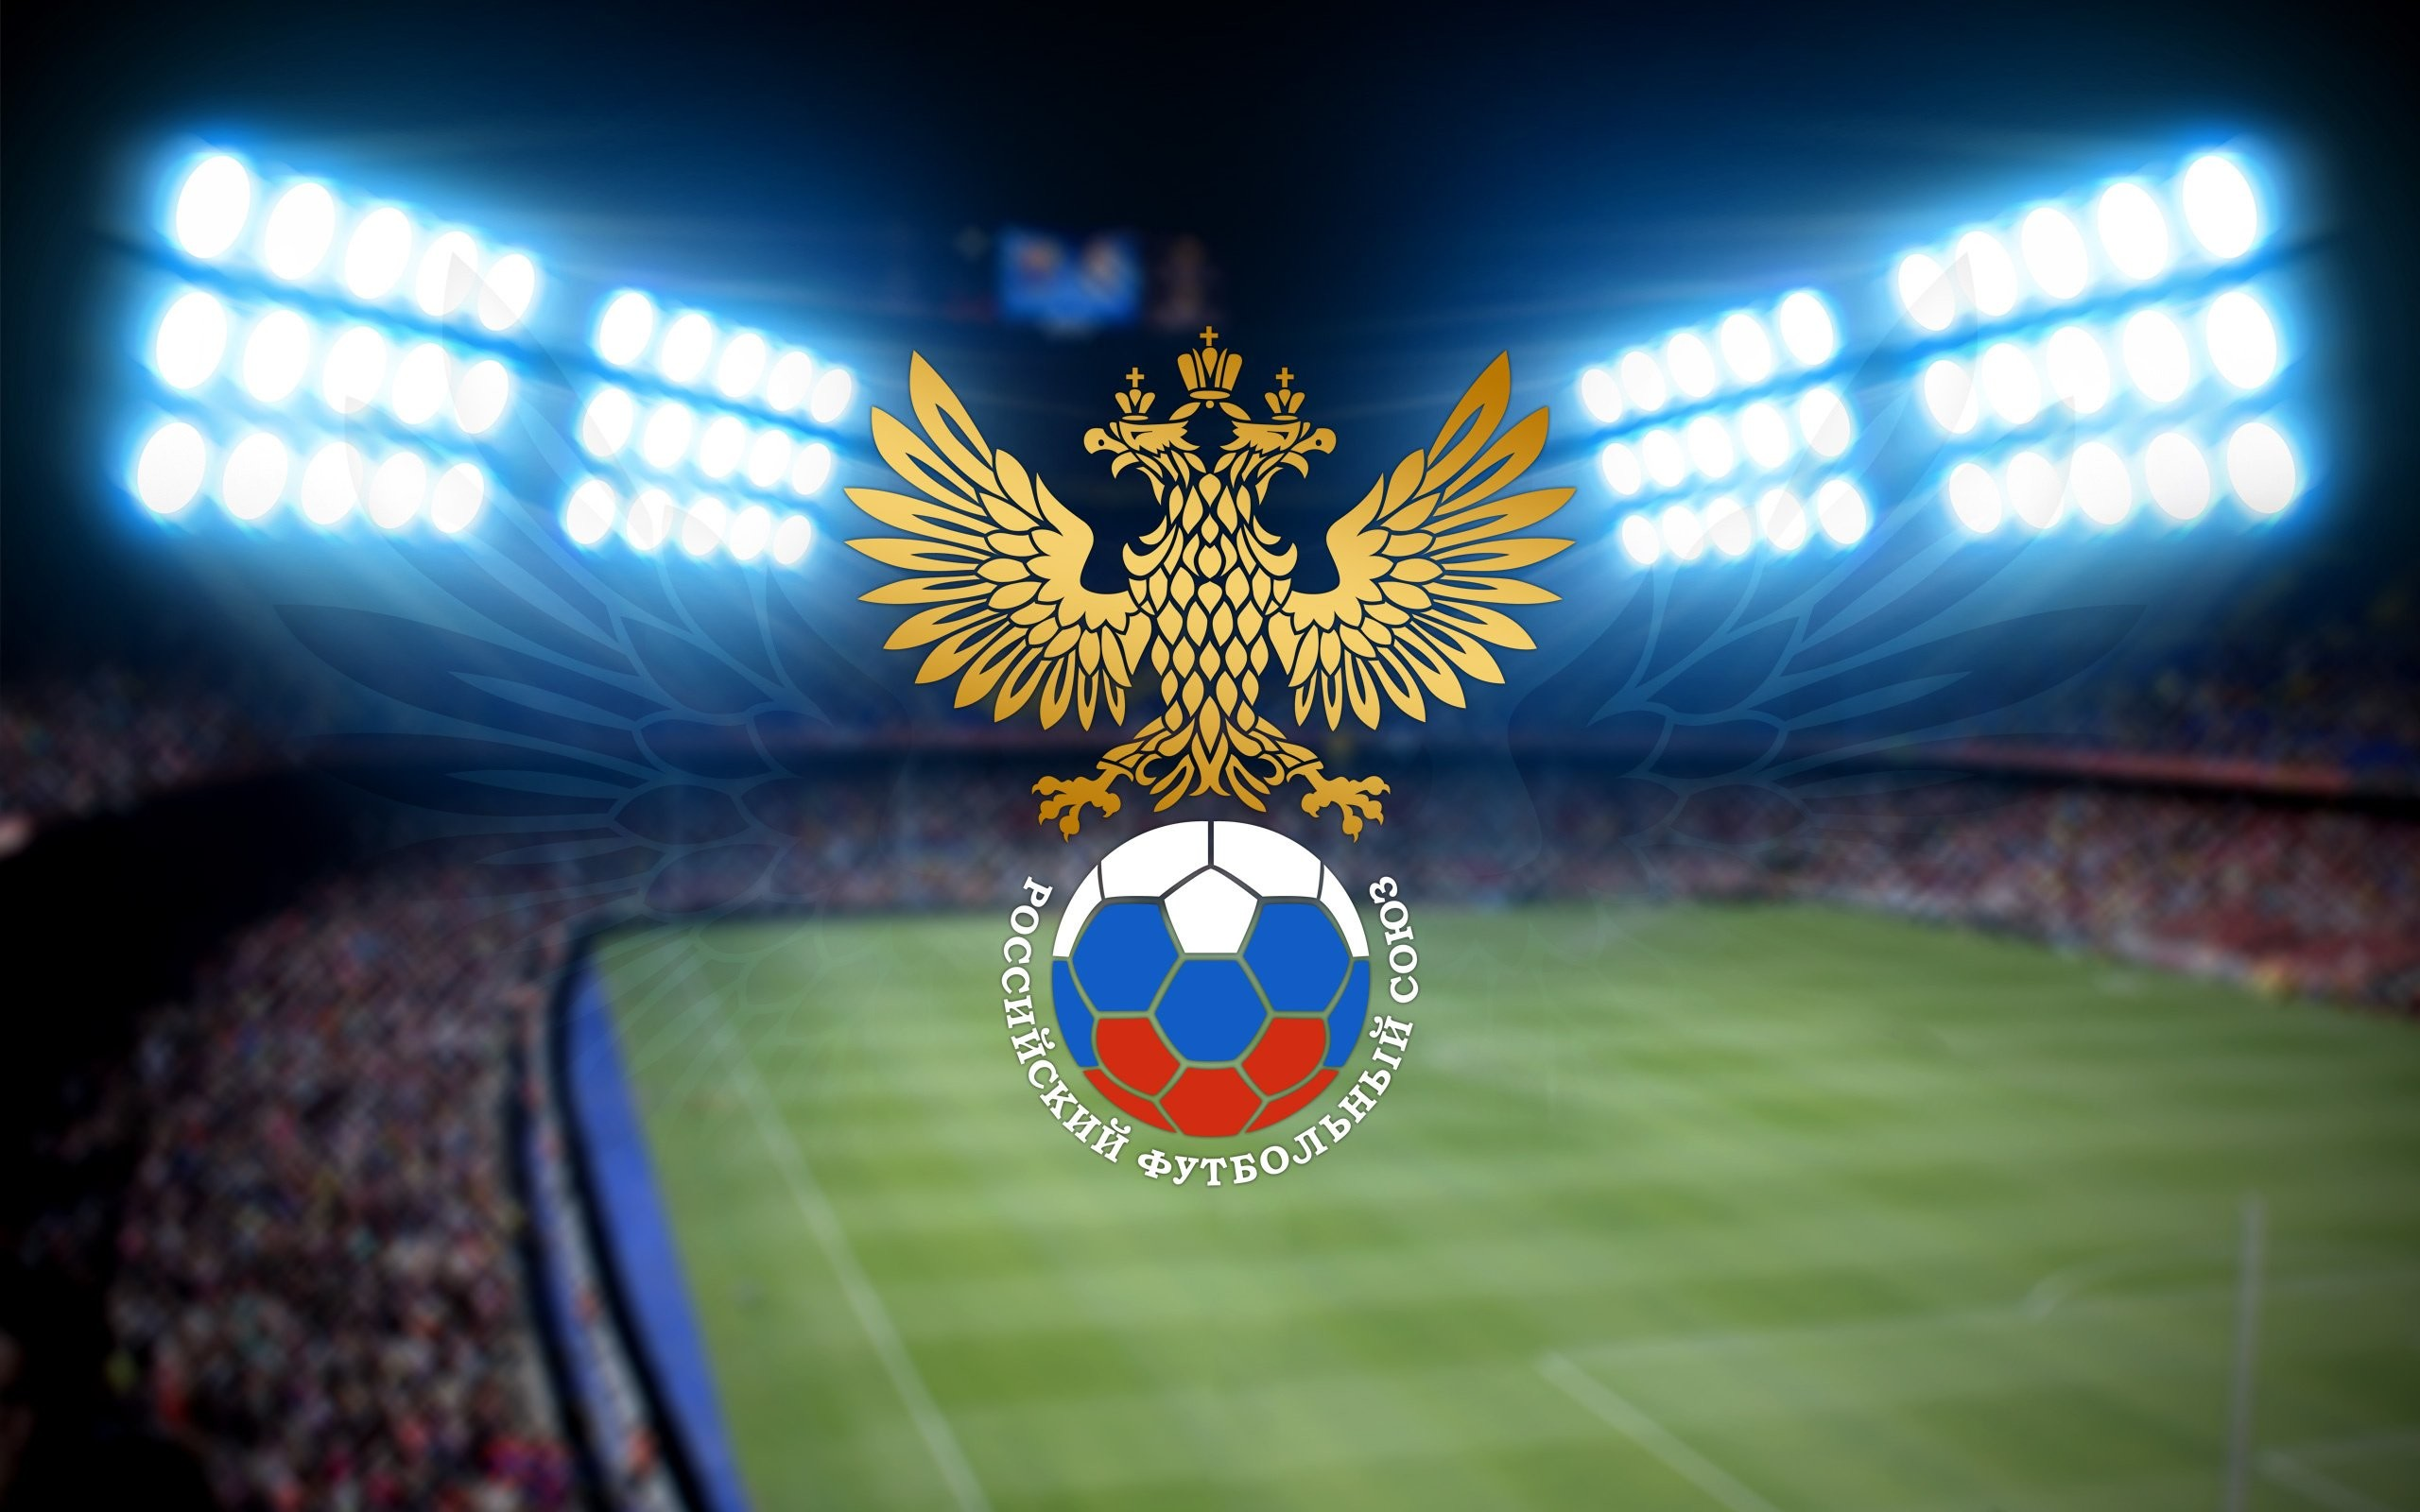 Russian Football Union RFU coat of arms stadium soccer wallpaper |  | 336088 | WallpaperUP